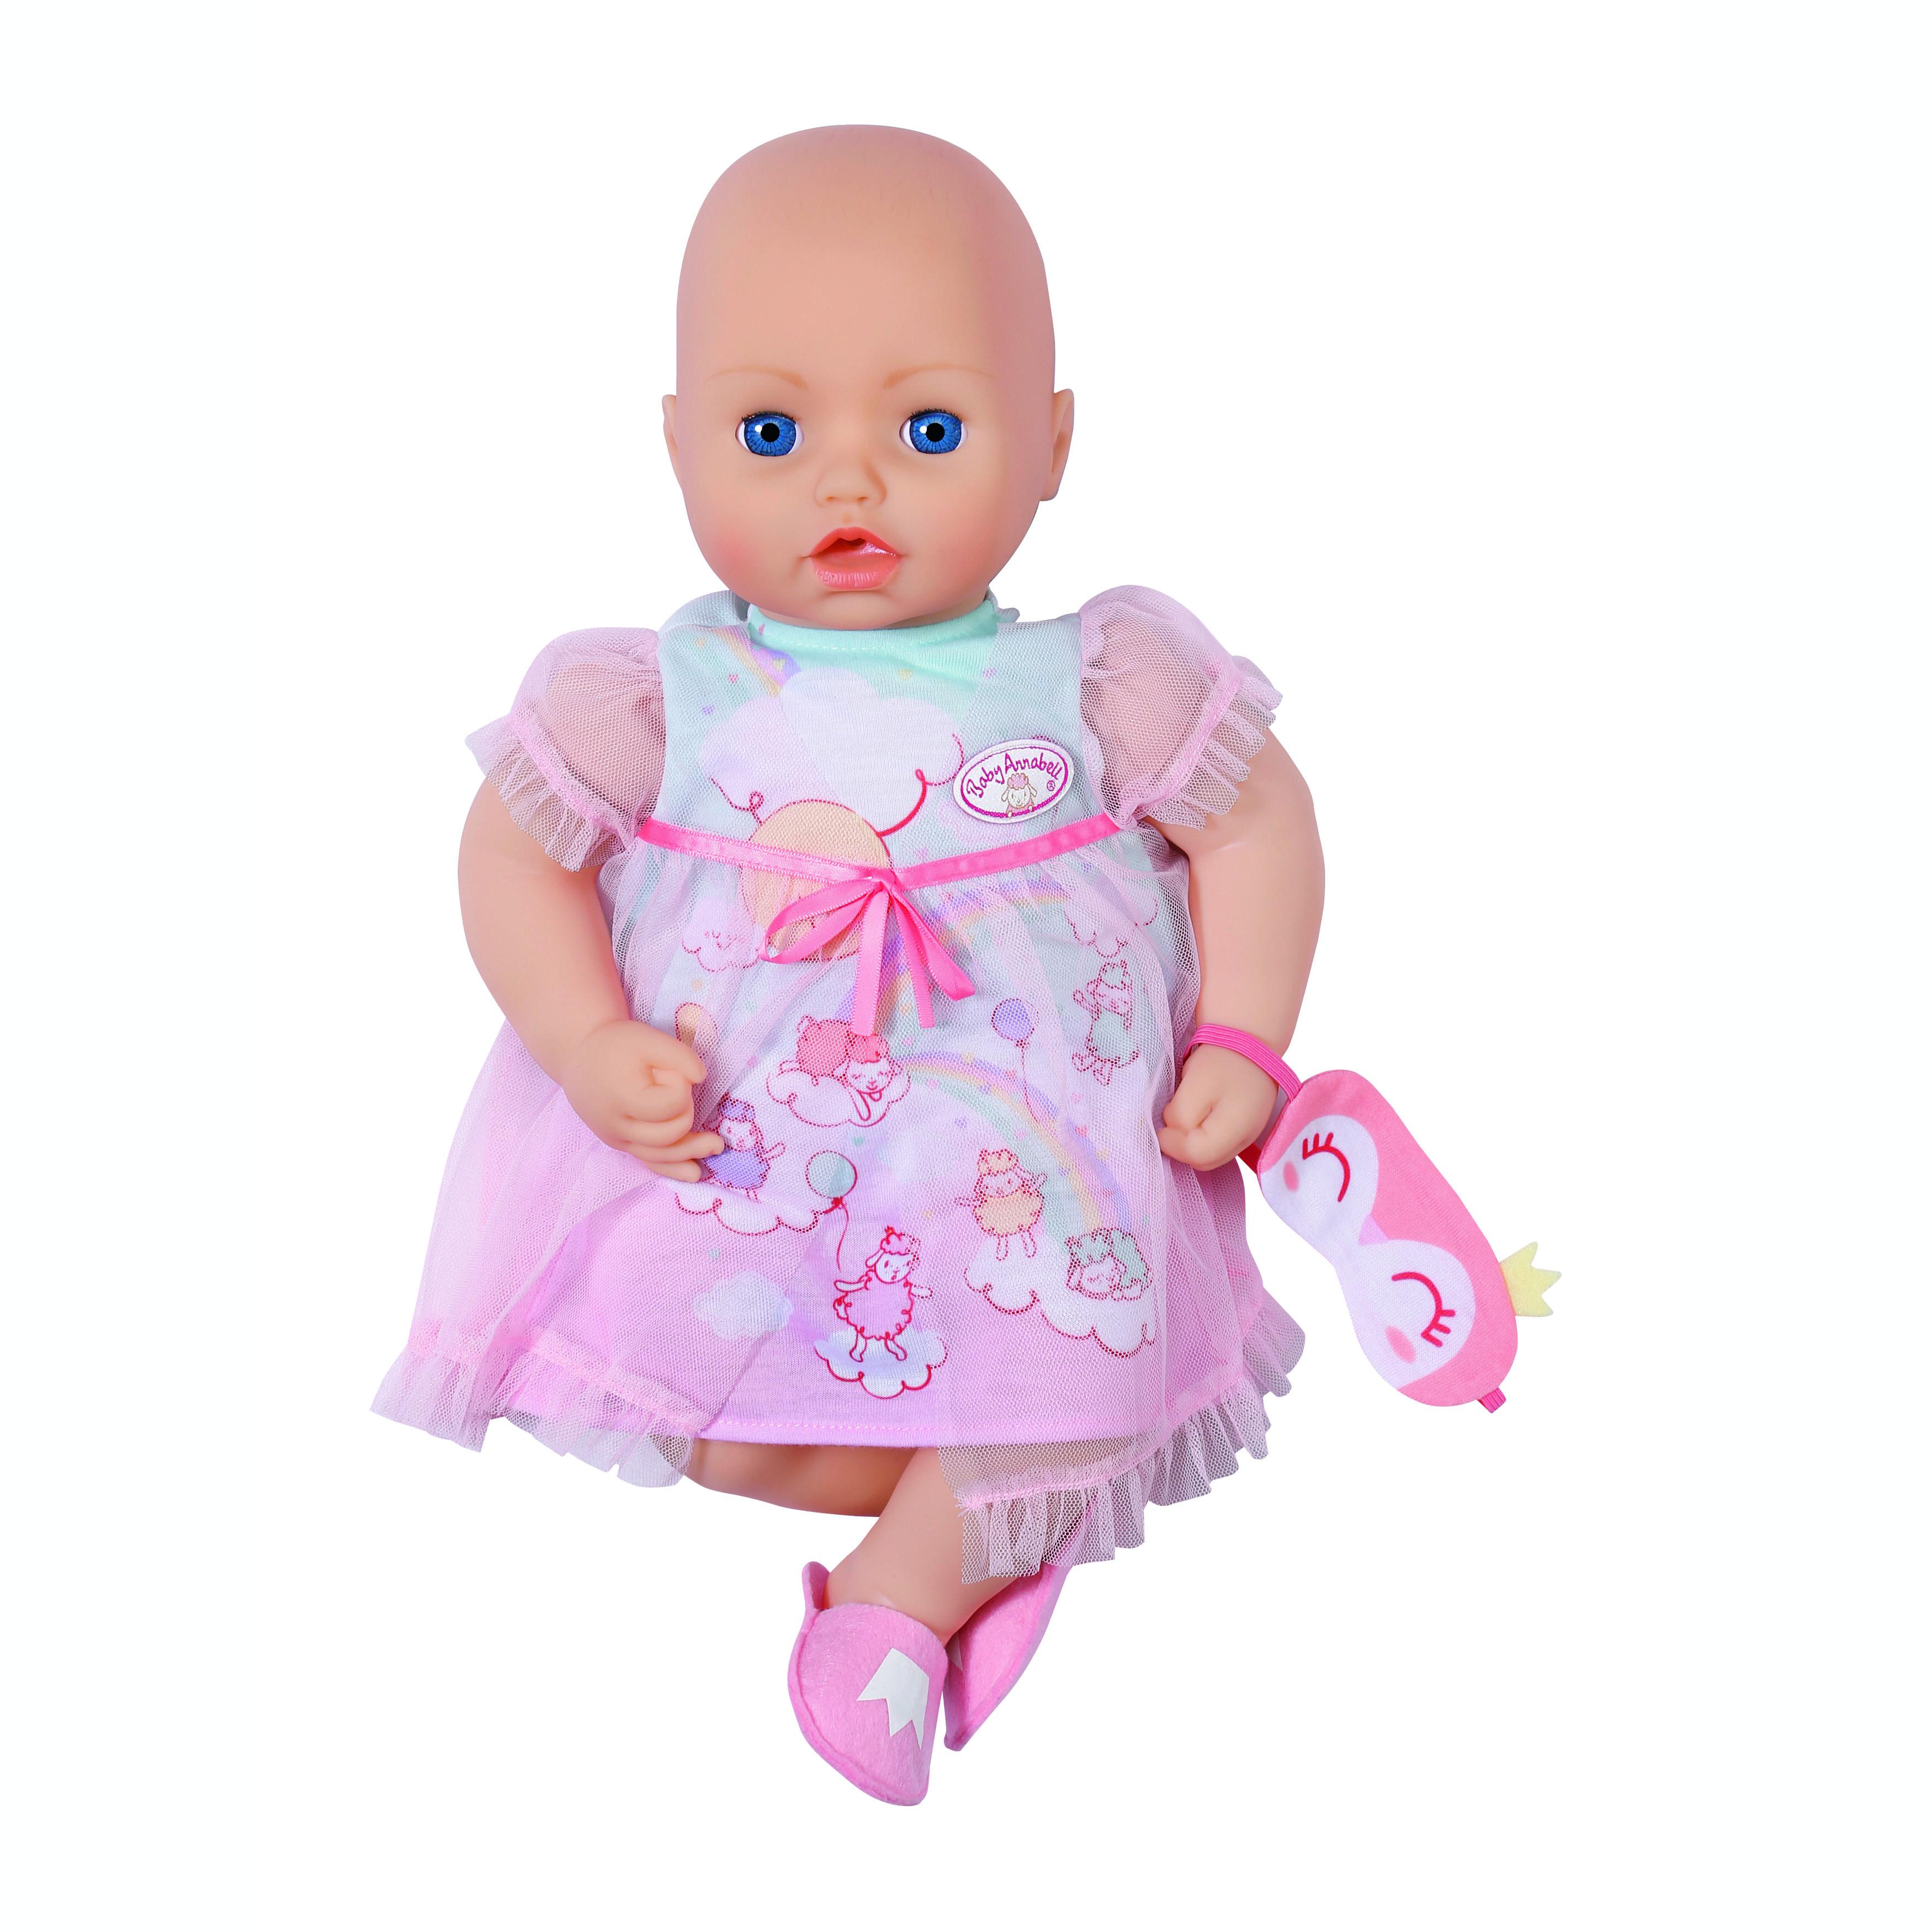 Baby Annabell Drømme Natkjole, 43 cm